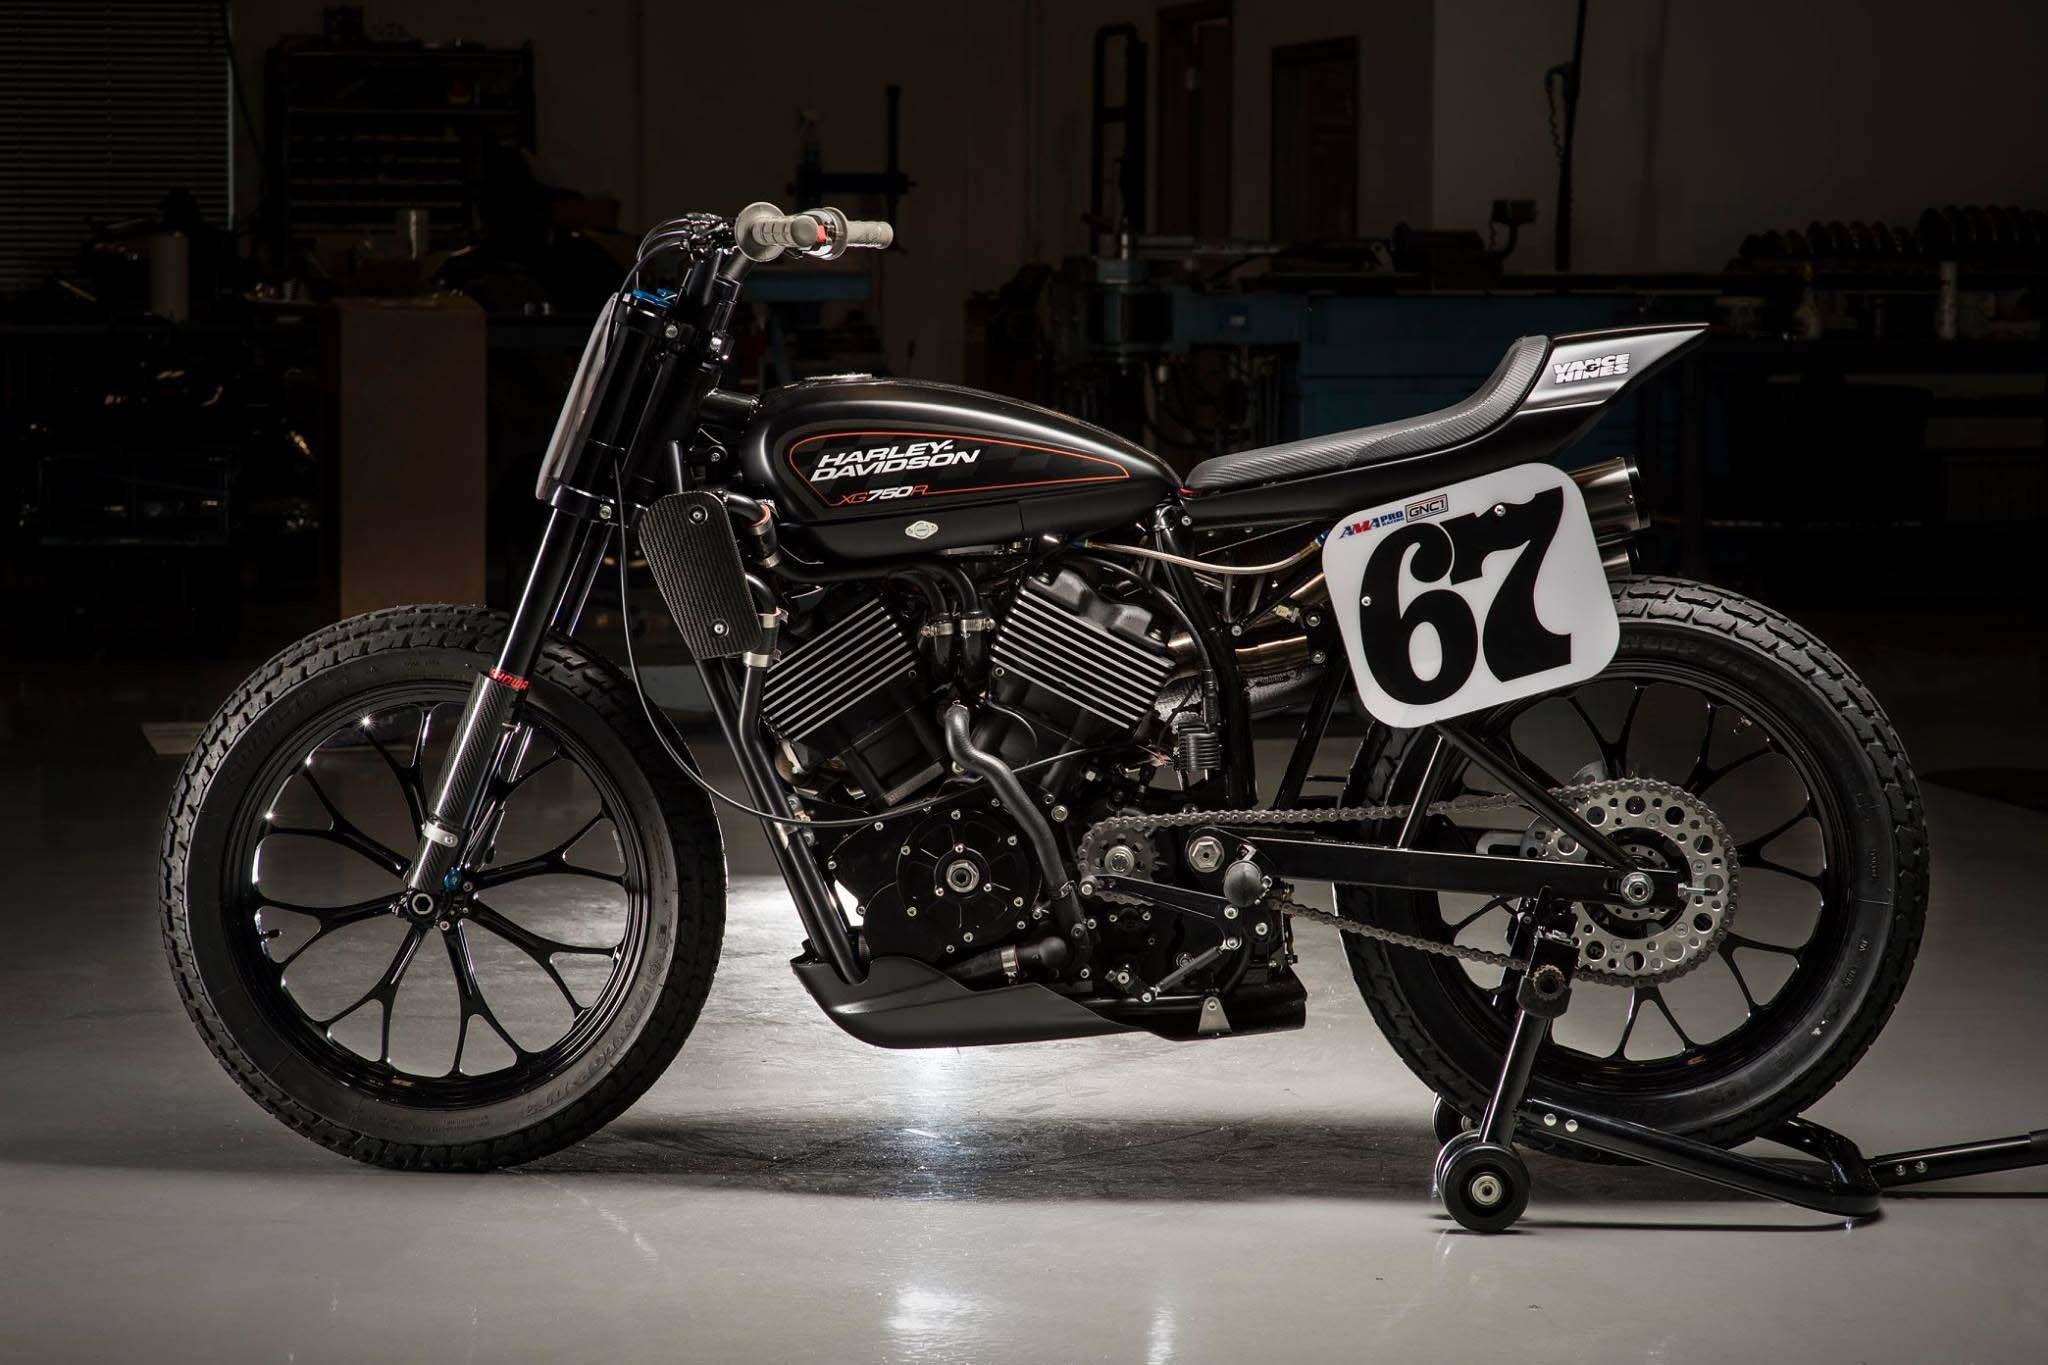 New Harley Davidson: New Harley-Davidson XG750R Flat-tracker Debuts